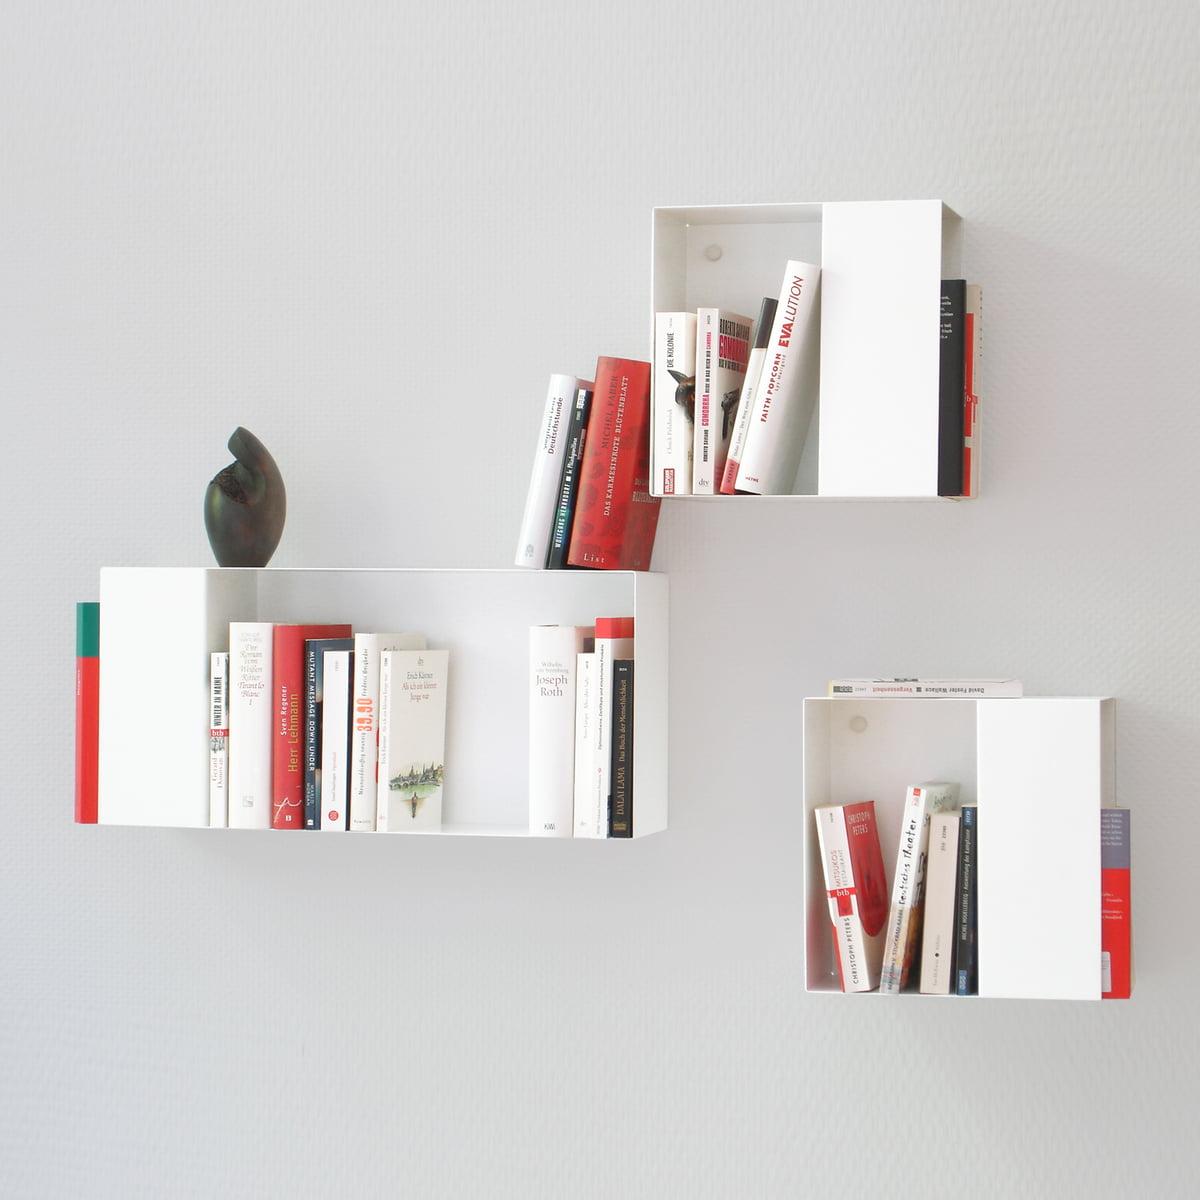 box artistic shelf shelves south wood amazing hanging interlocking design handmade a inside ideas home wall floating